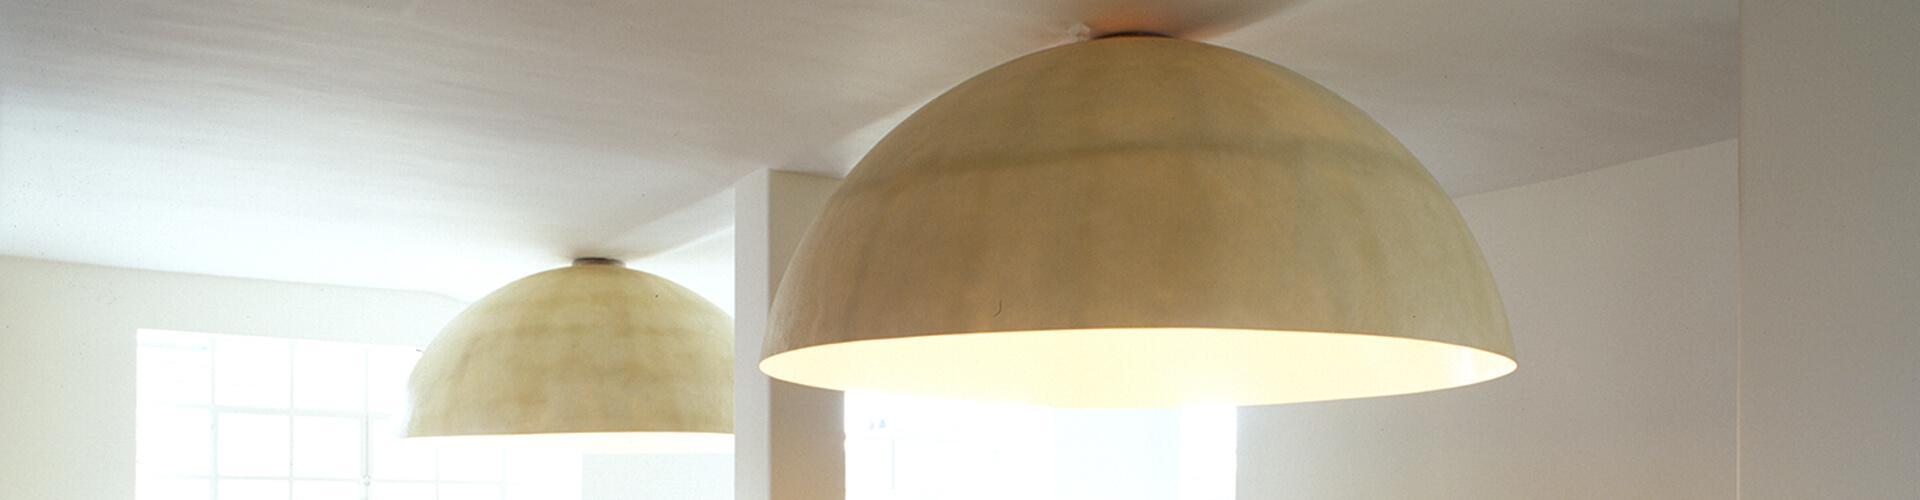 Sphere Large